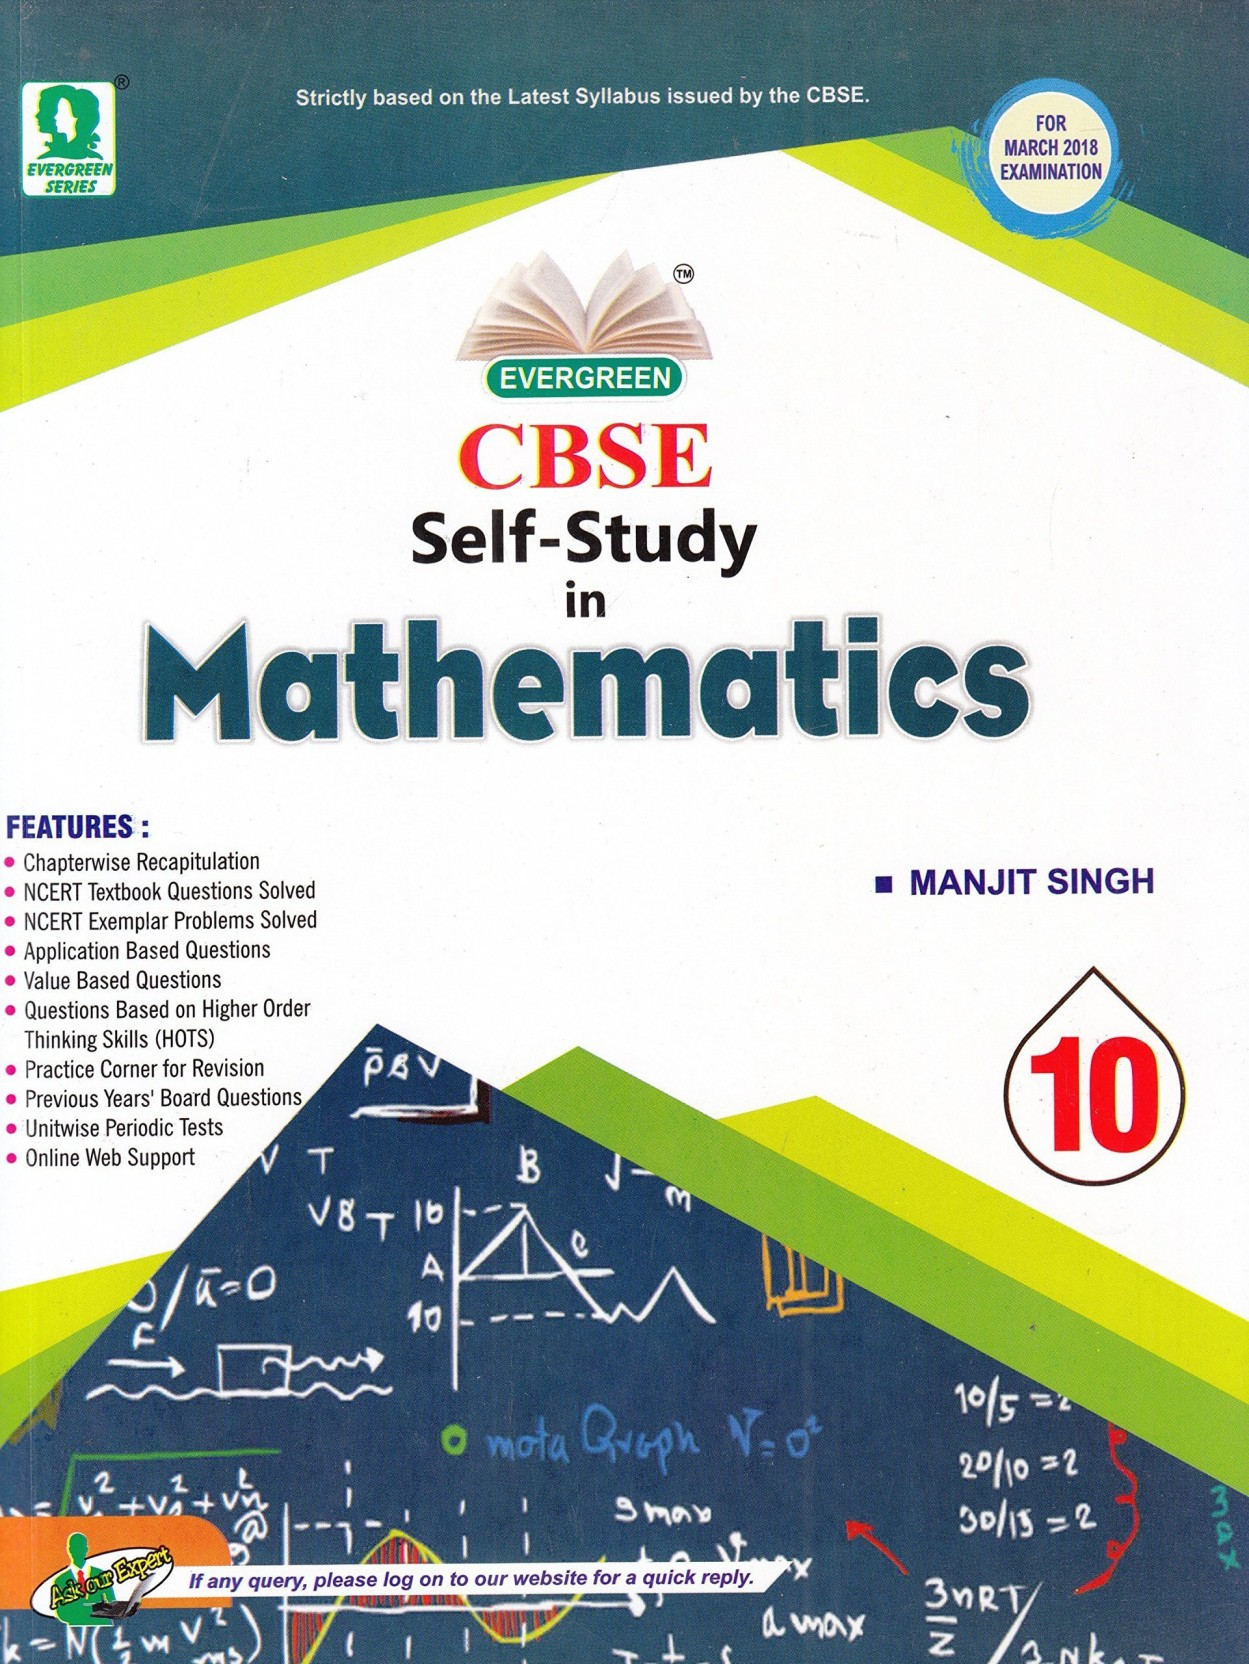 Evergreen CBSE Self Study in Mathematics 01 Edition. ADD TO CART